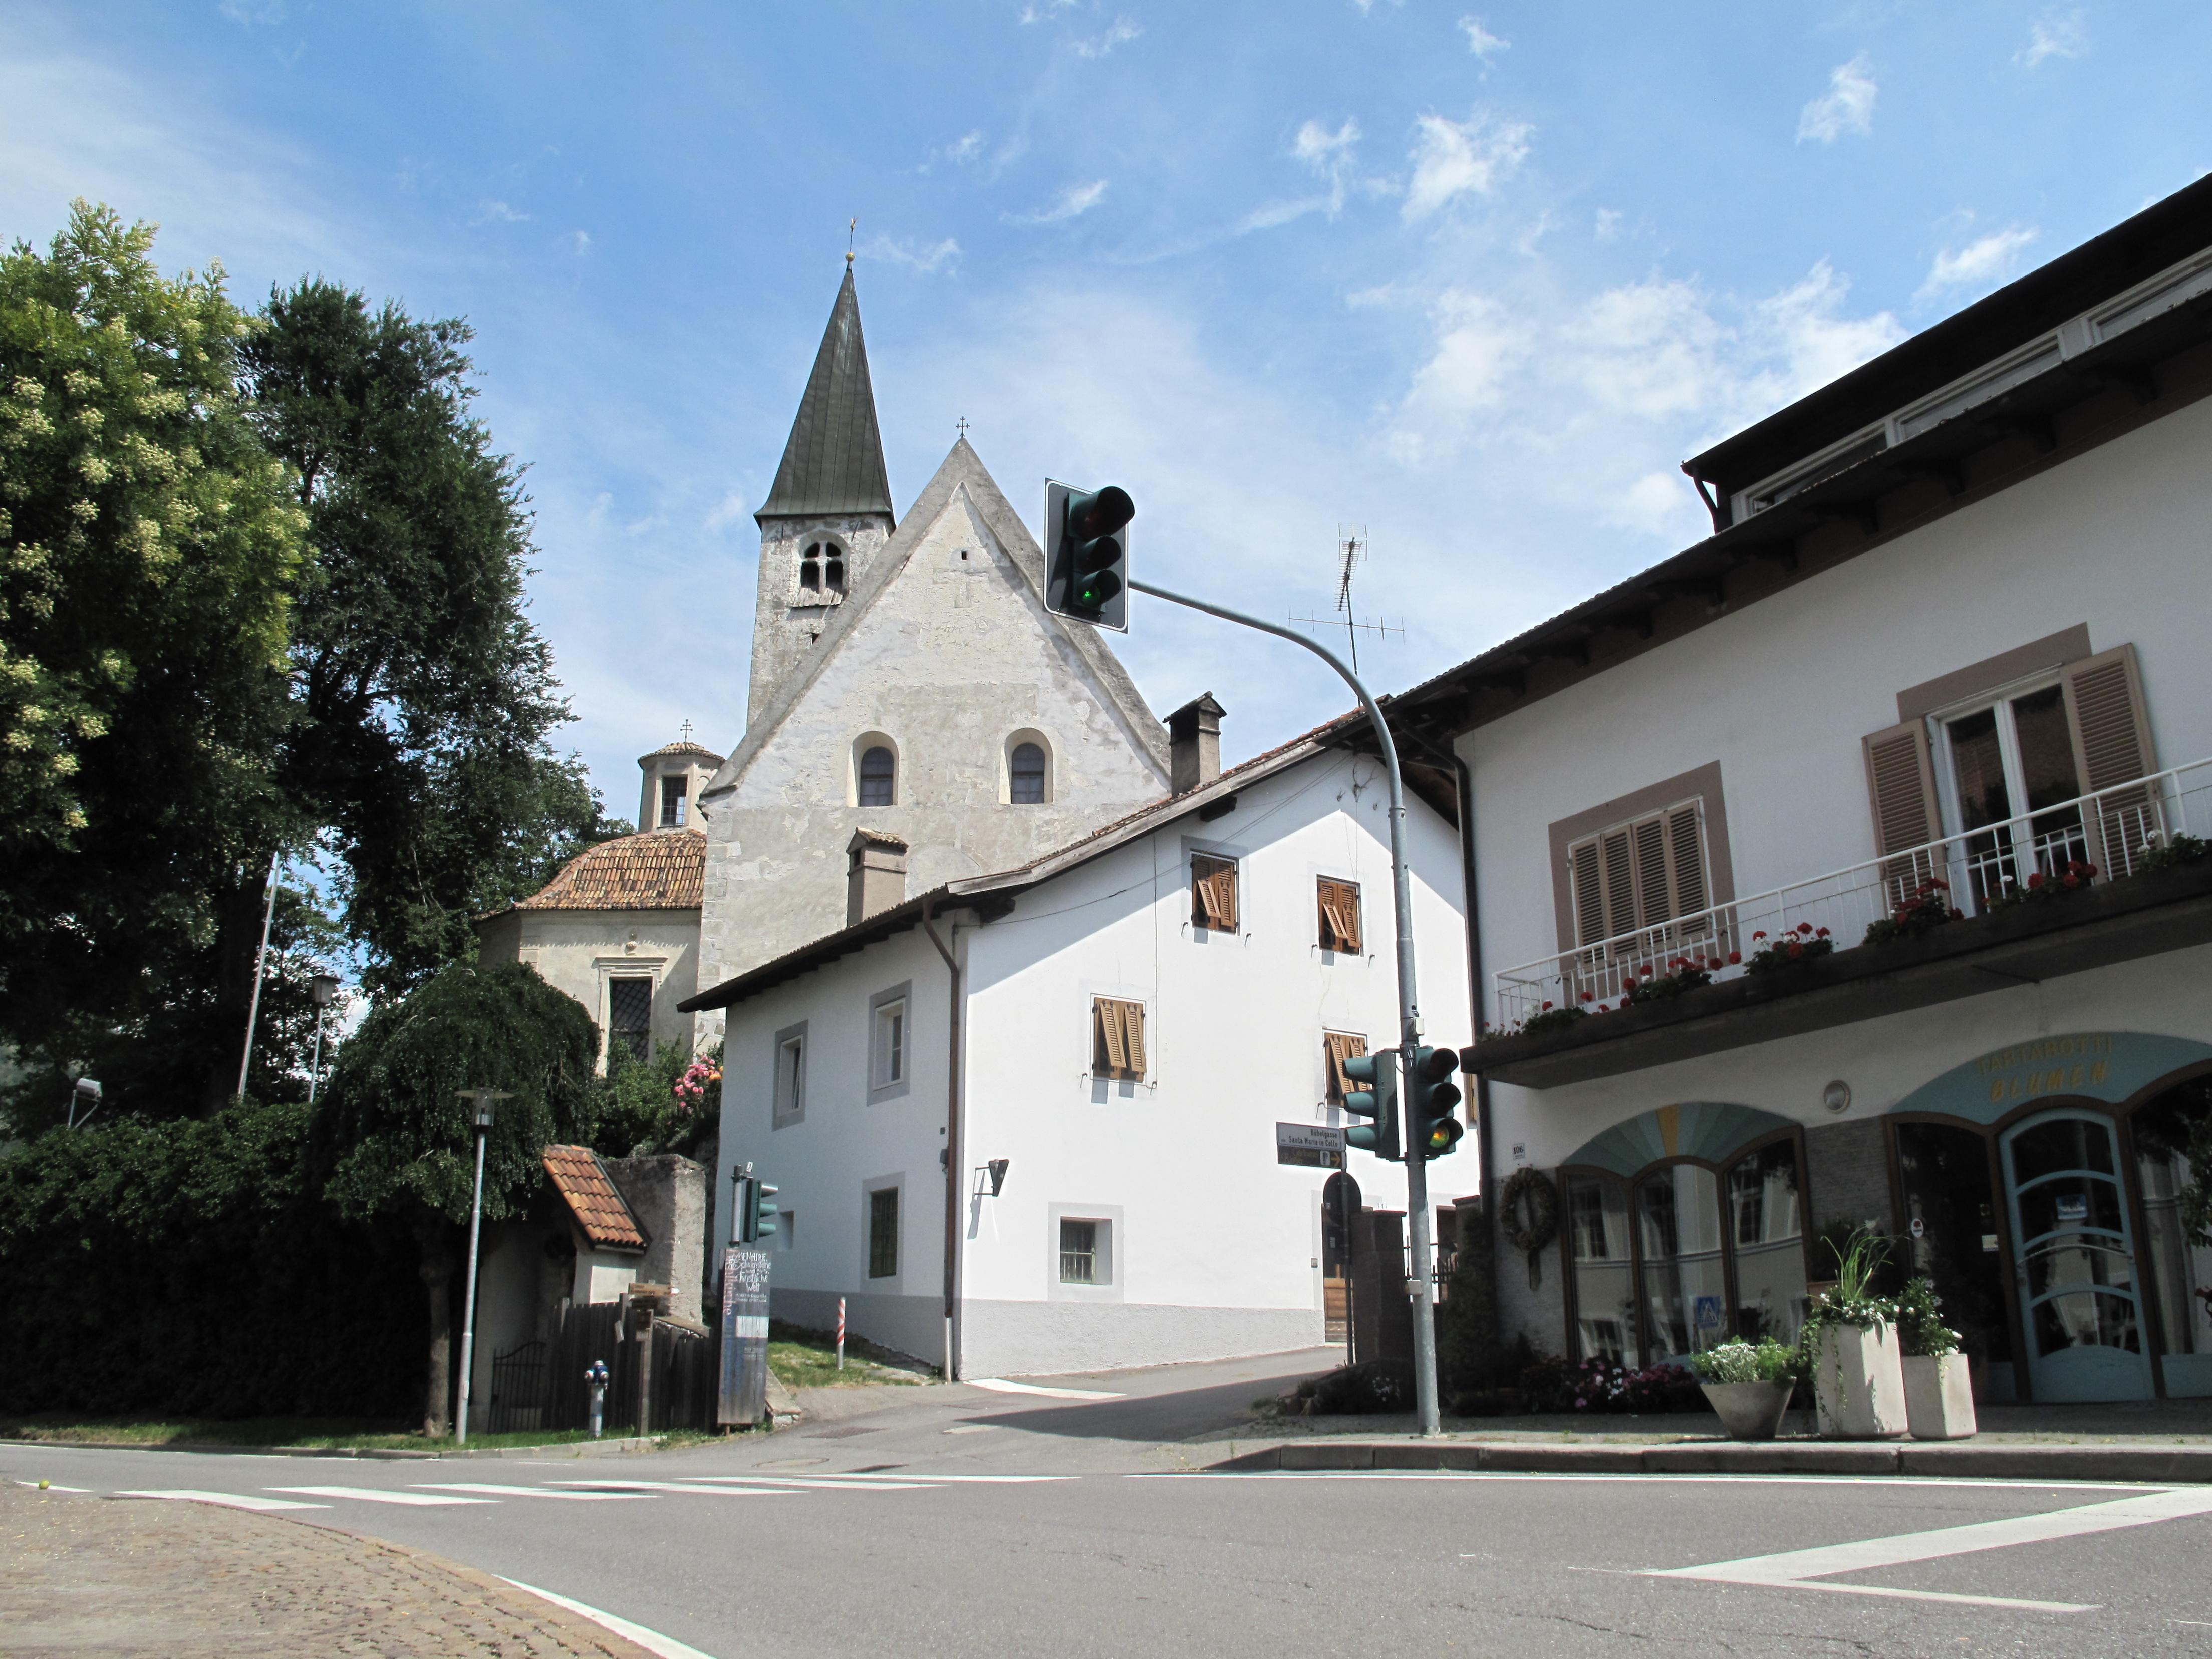 latsch, monumenale kerk (dm15656) in straatzicht foto1 2012-08-12 14.16.jpg